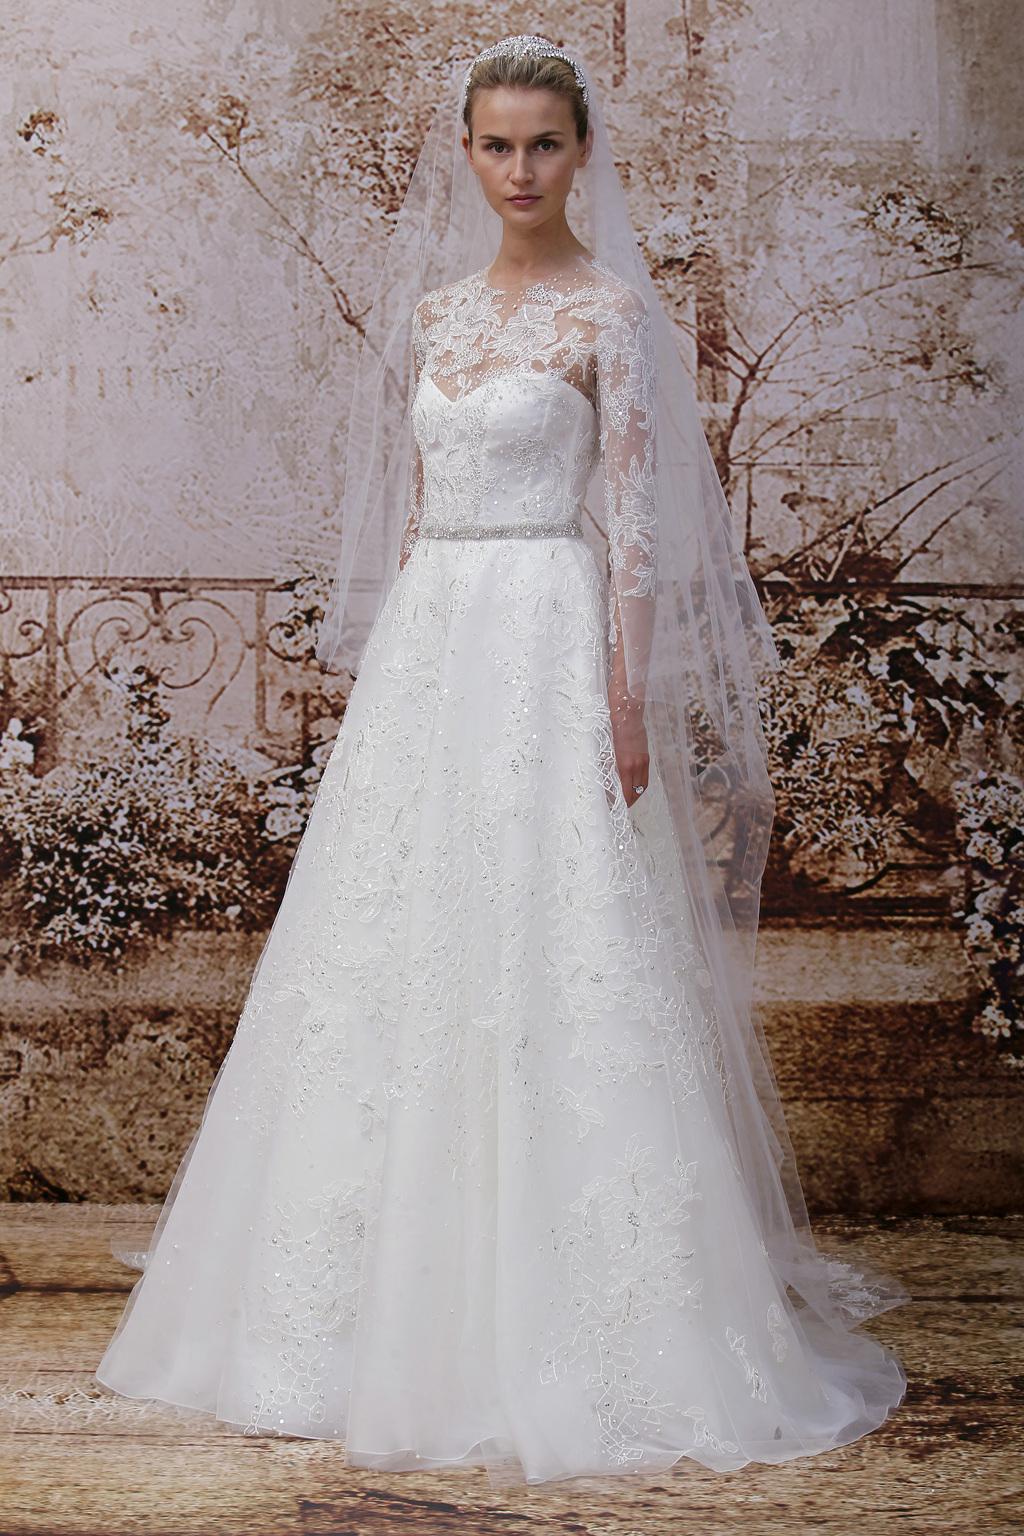 Monique-lhuillier-fall-2014-wedding-dress-look-21.full